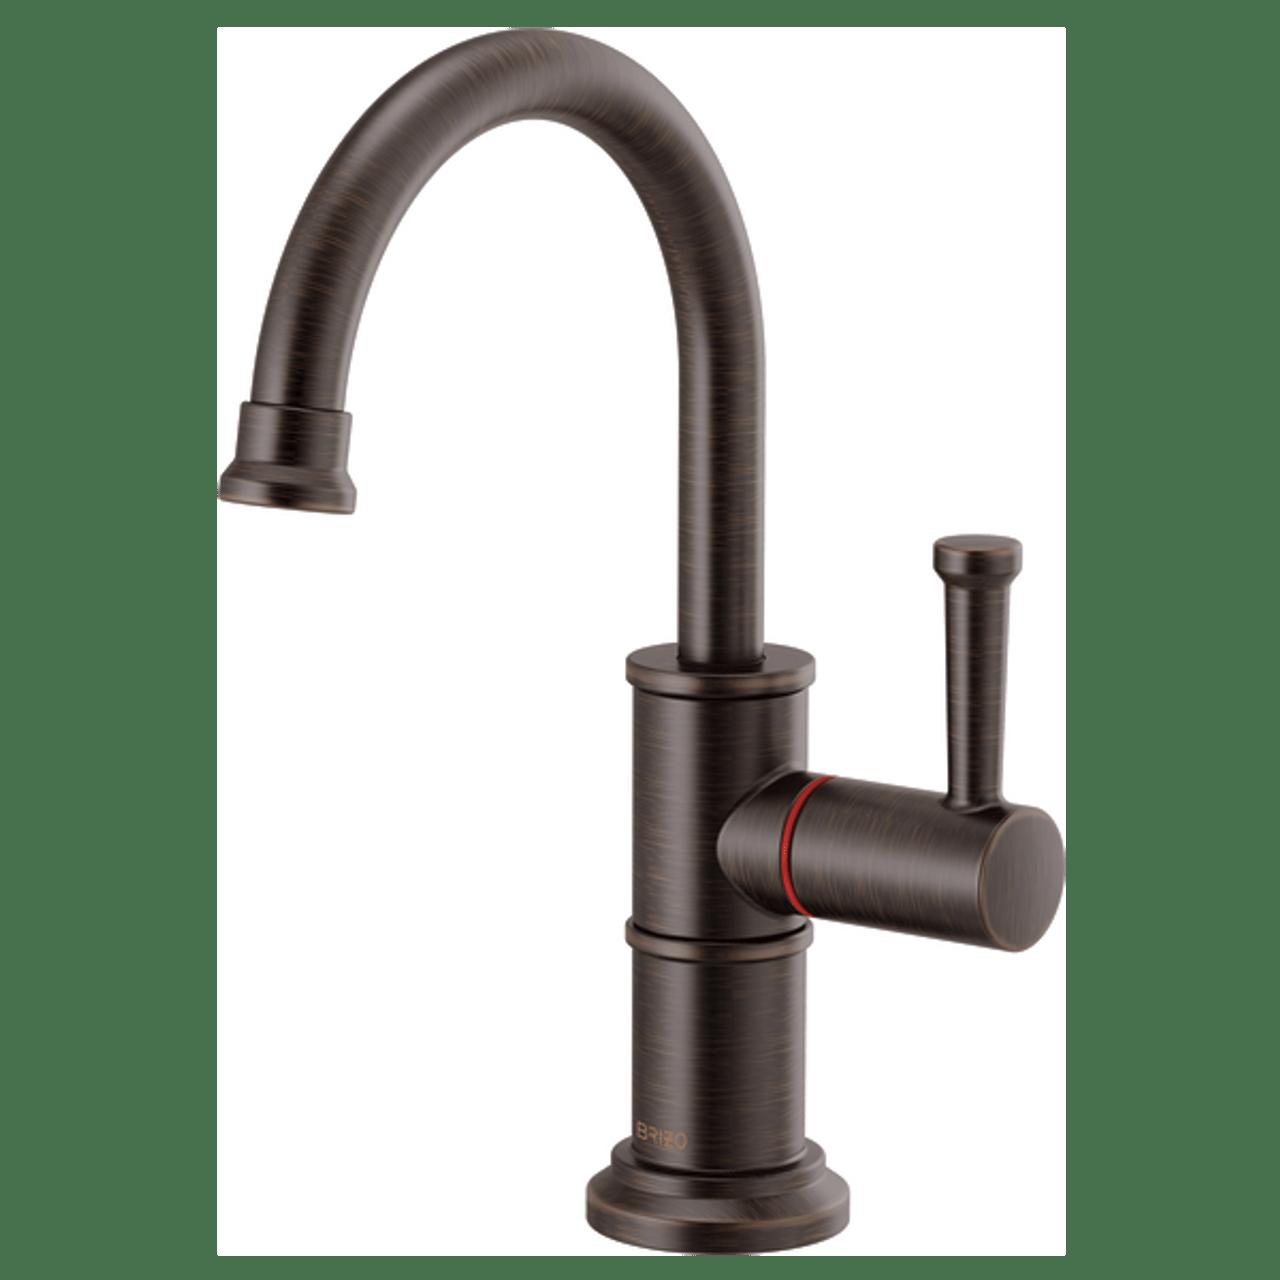 brizo artesso instant hot faucet with arc spout in venetian bronze